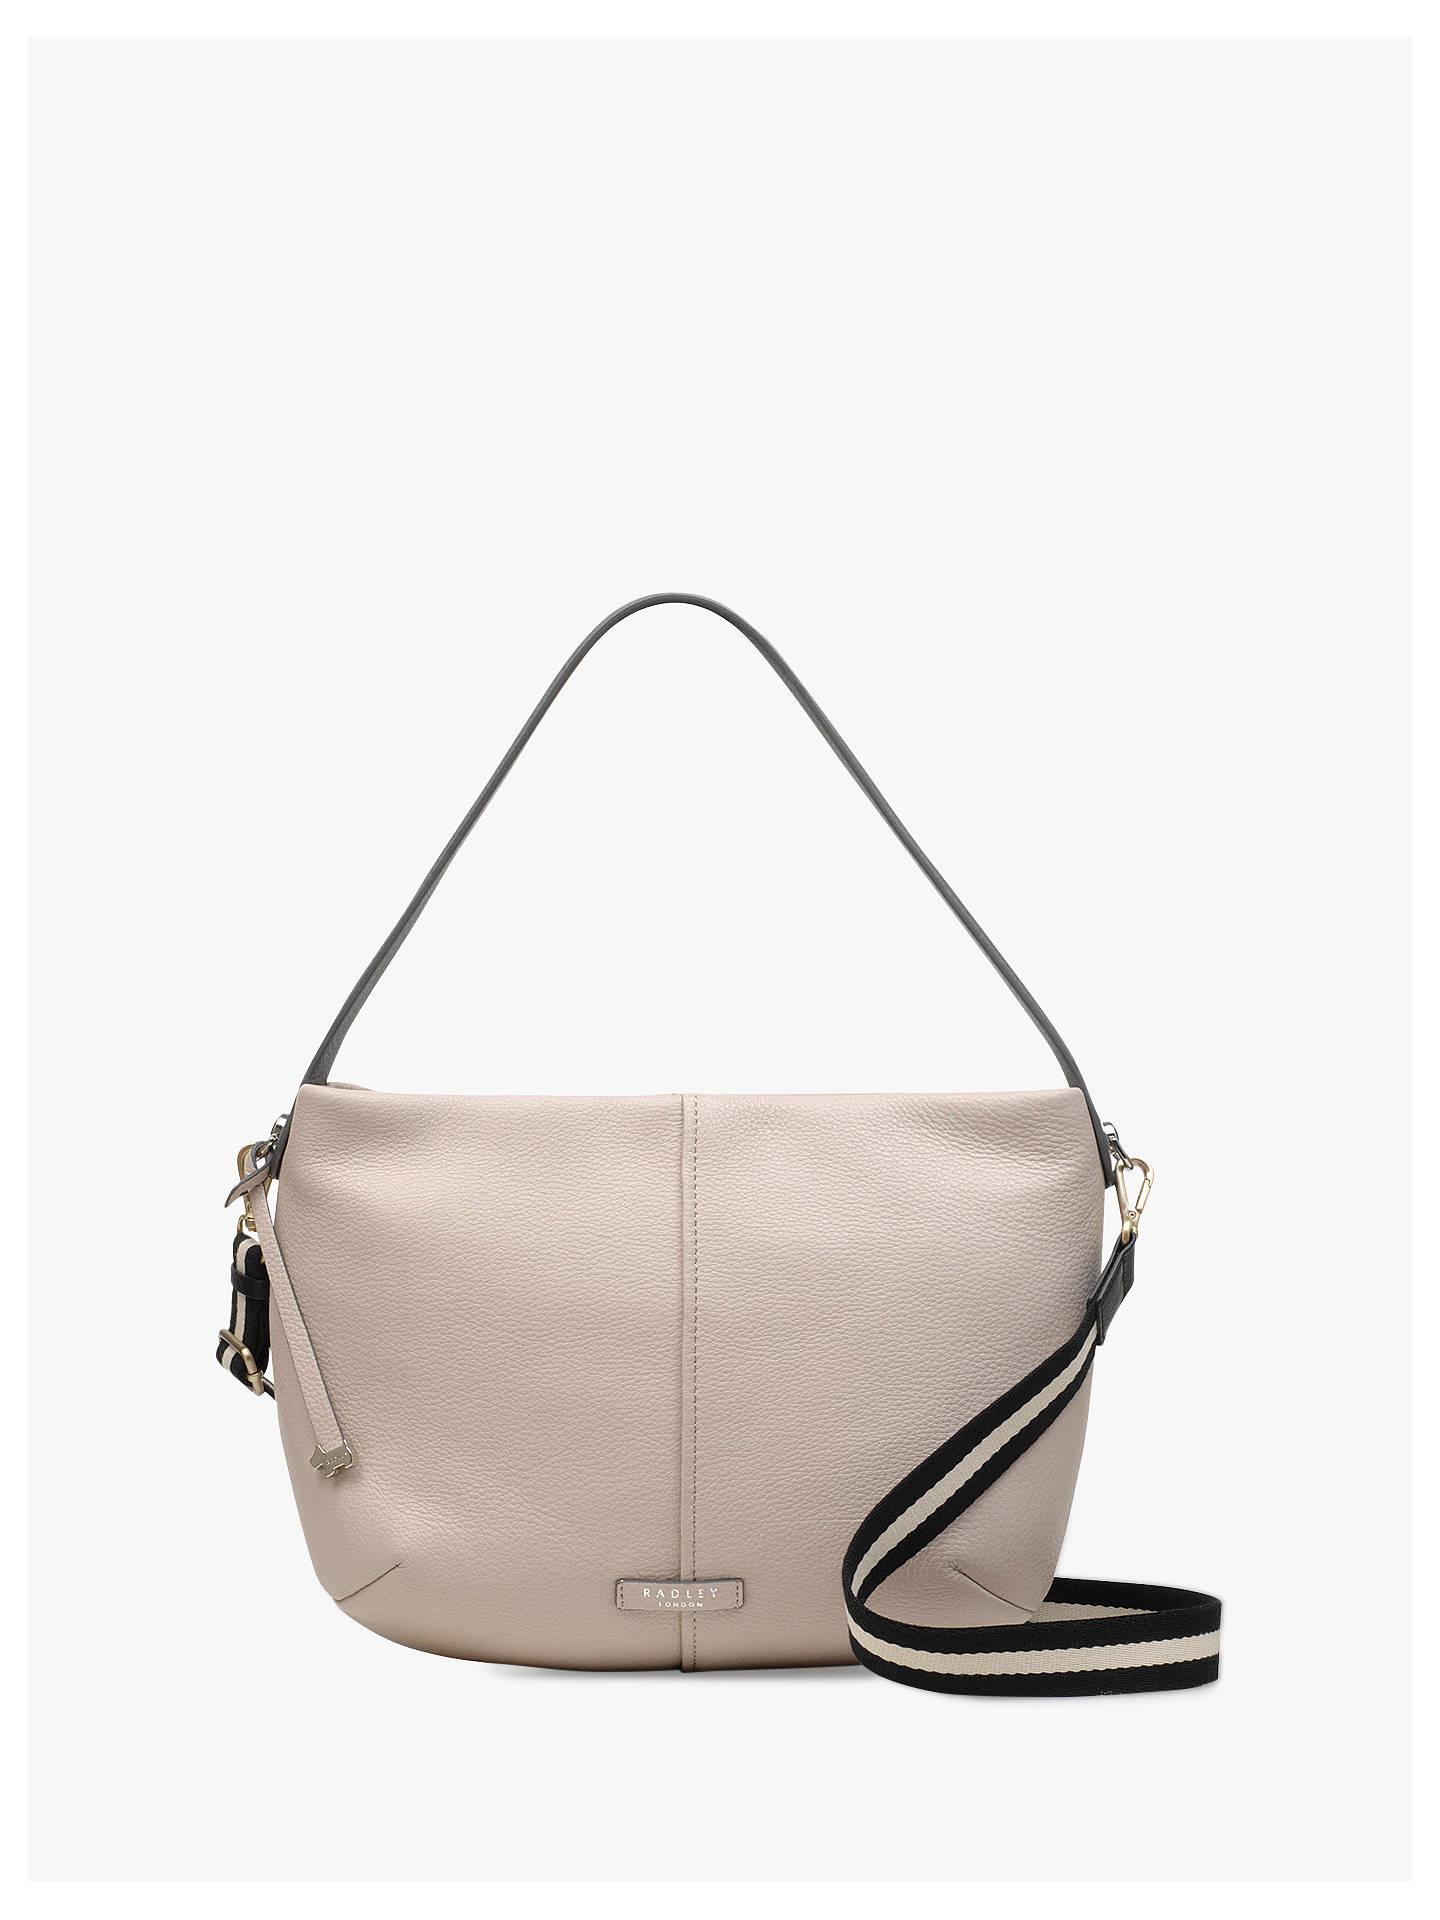 c2d6bc7608 Radley Rose Castle Leather Large Zip Top Cross Body Bag, Dove Grey